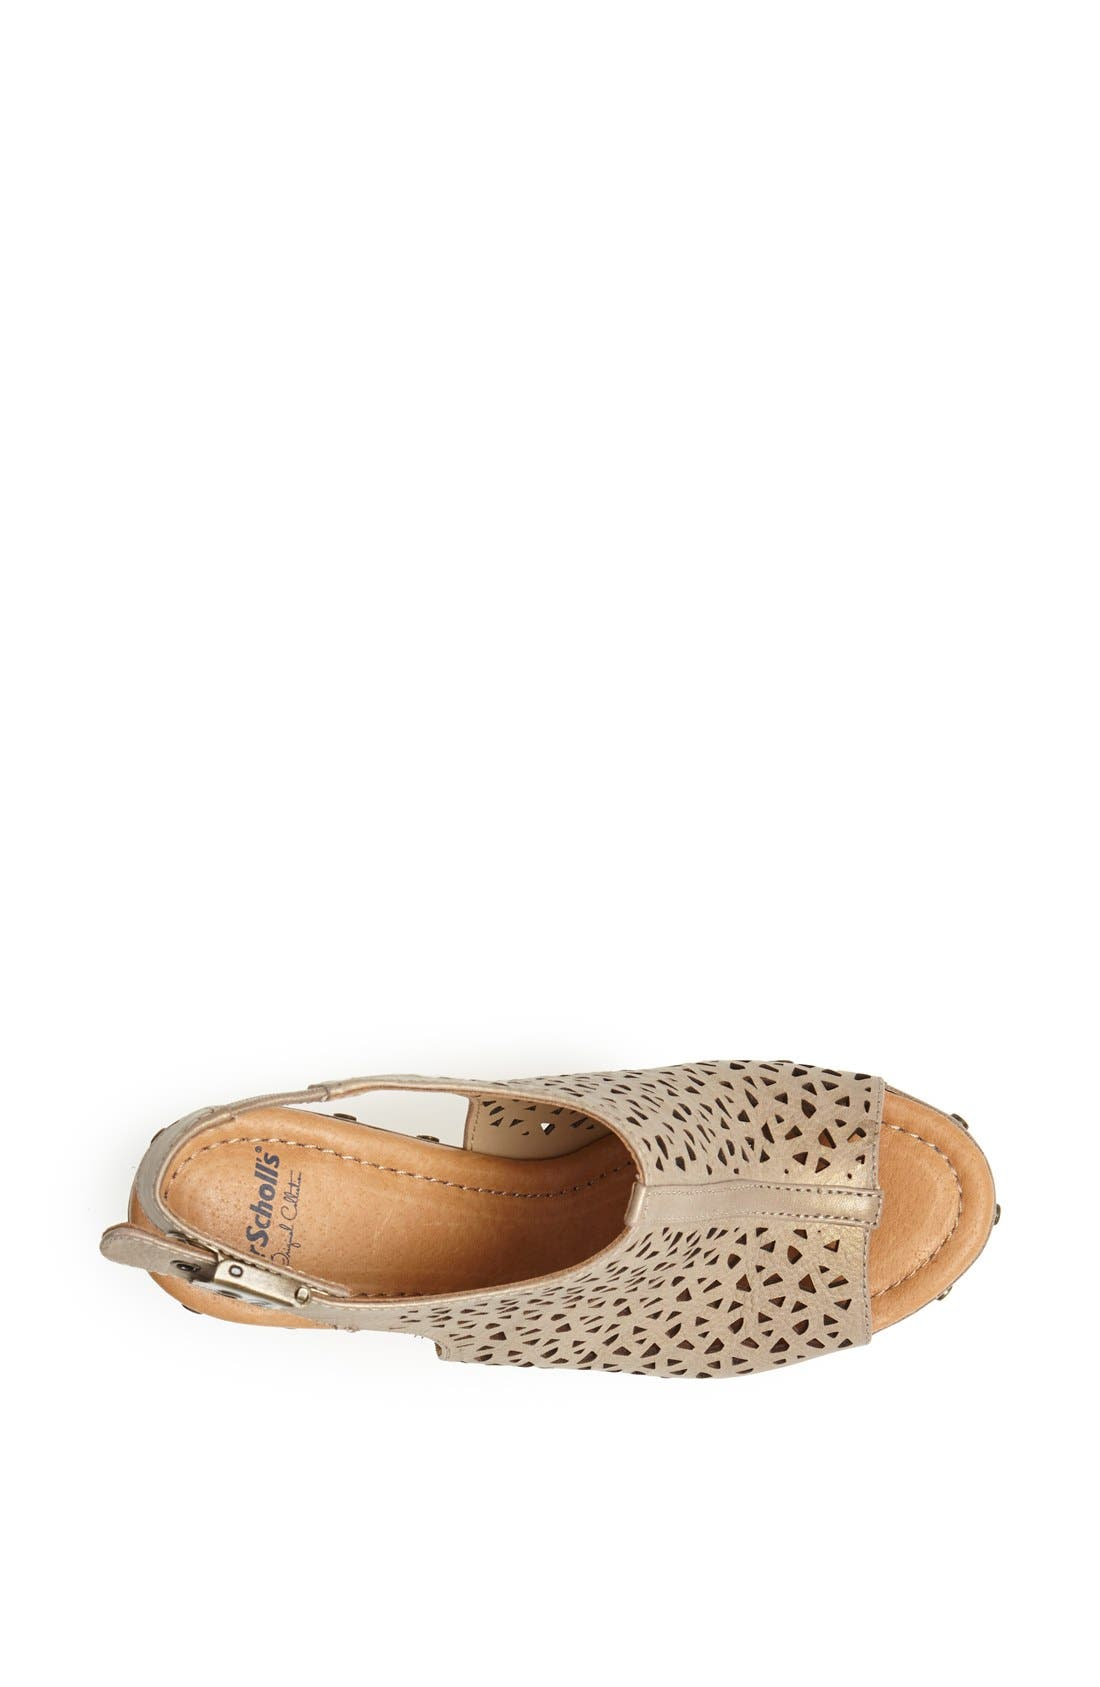 Alternate Image 3  - Dr. Scholl's Original Collection 'Alana' Sandal